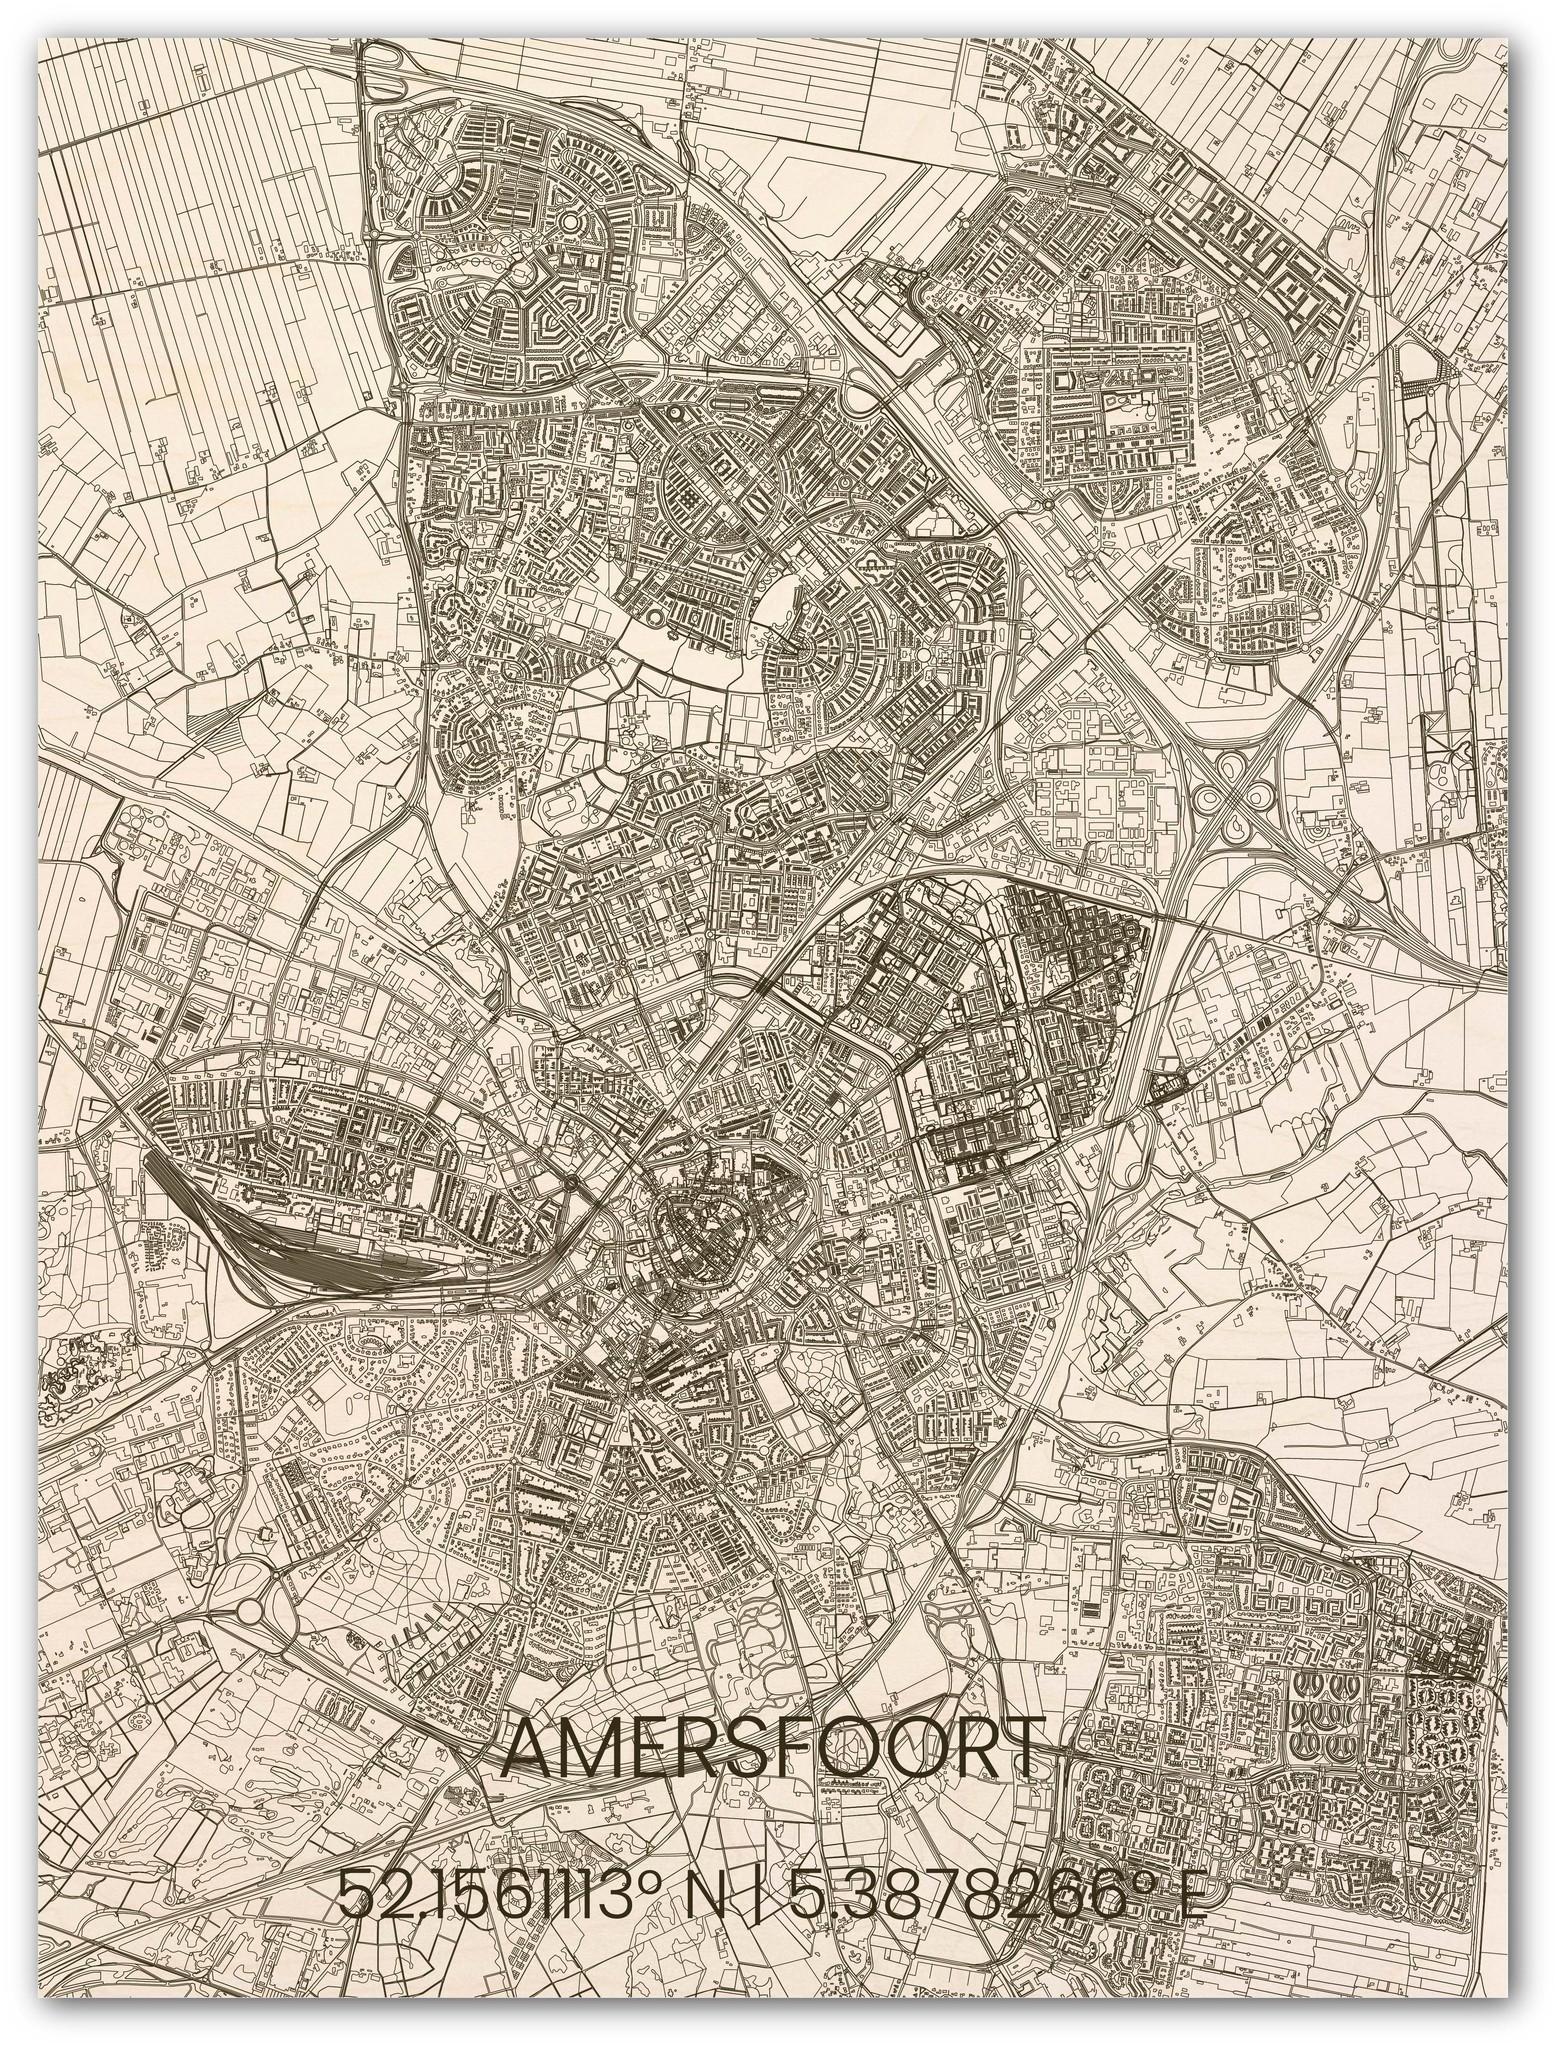 Houten stadsplattegrond Amersfoort-1